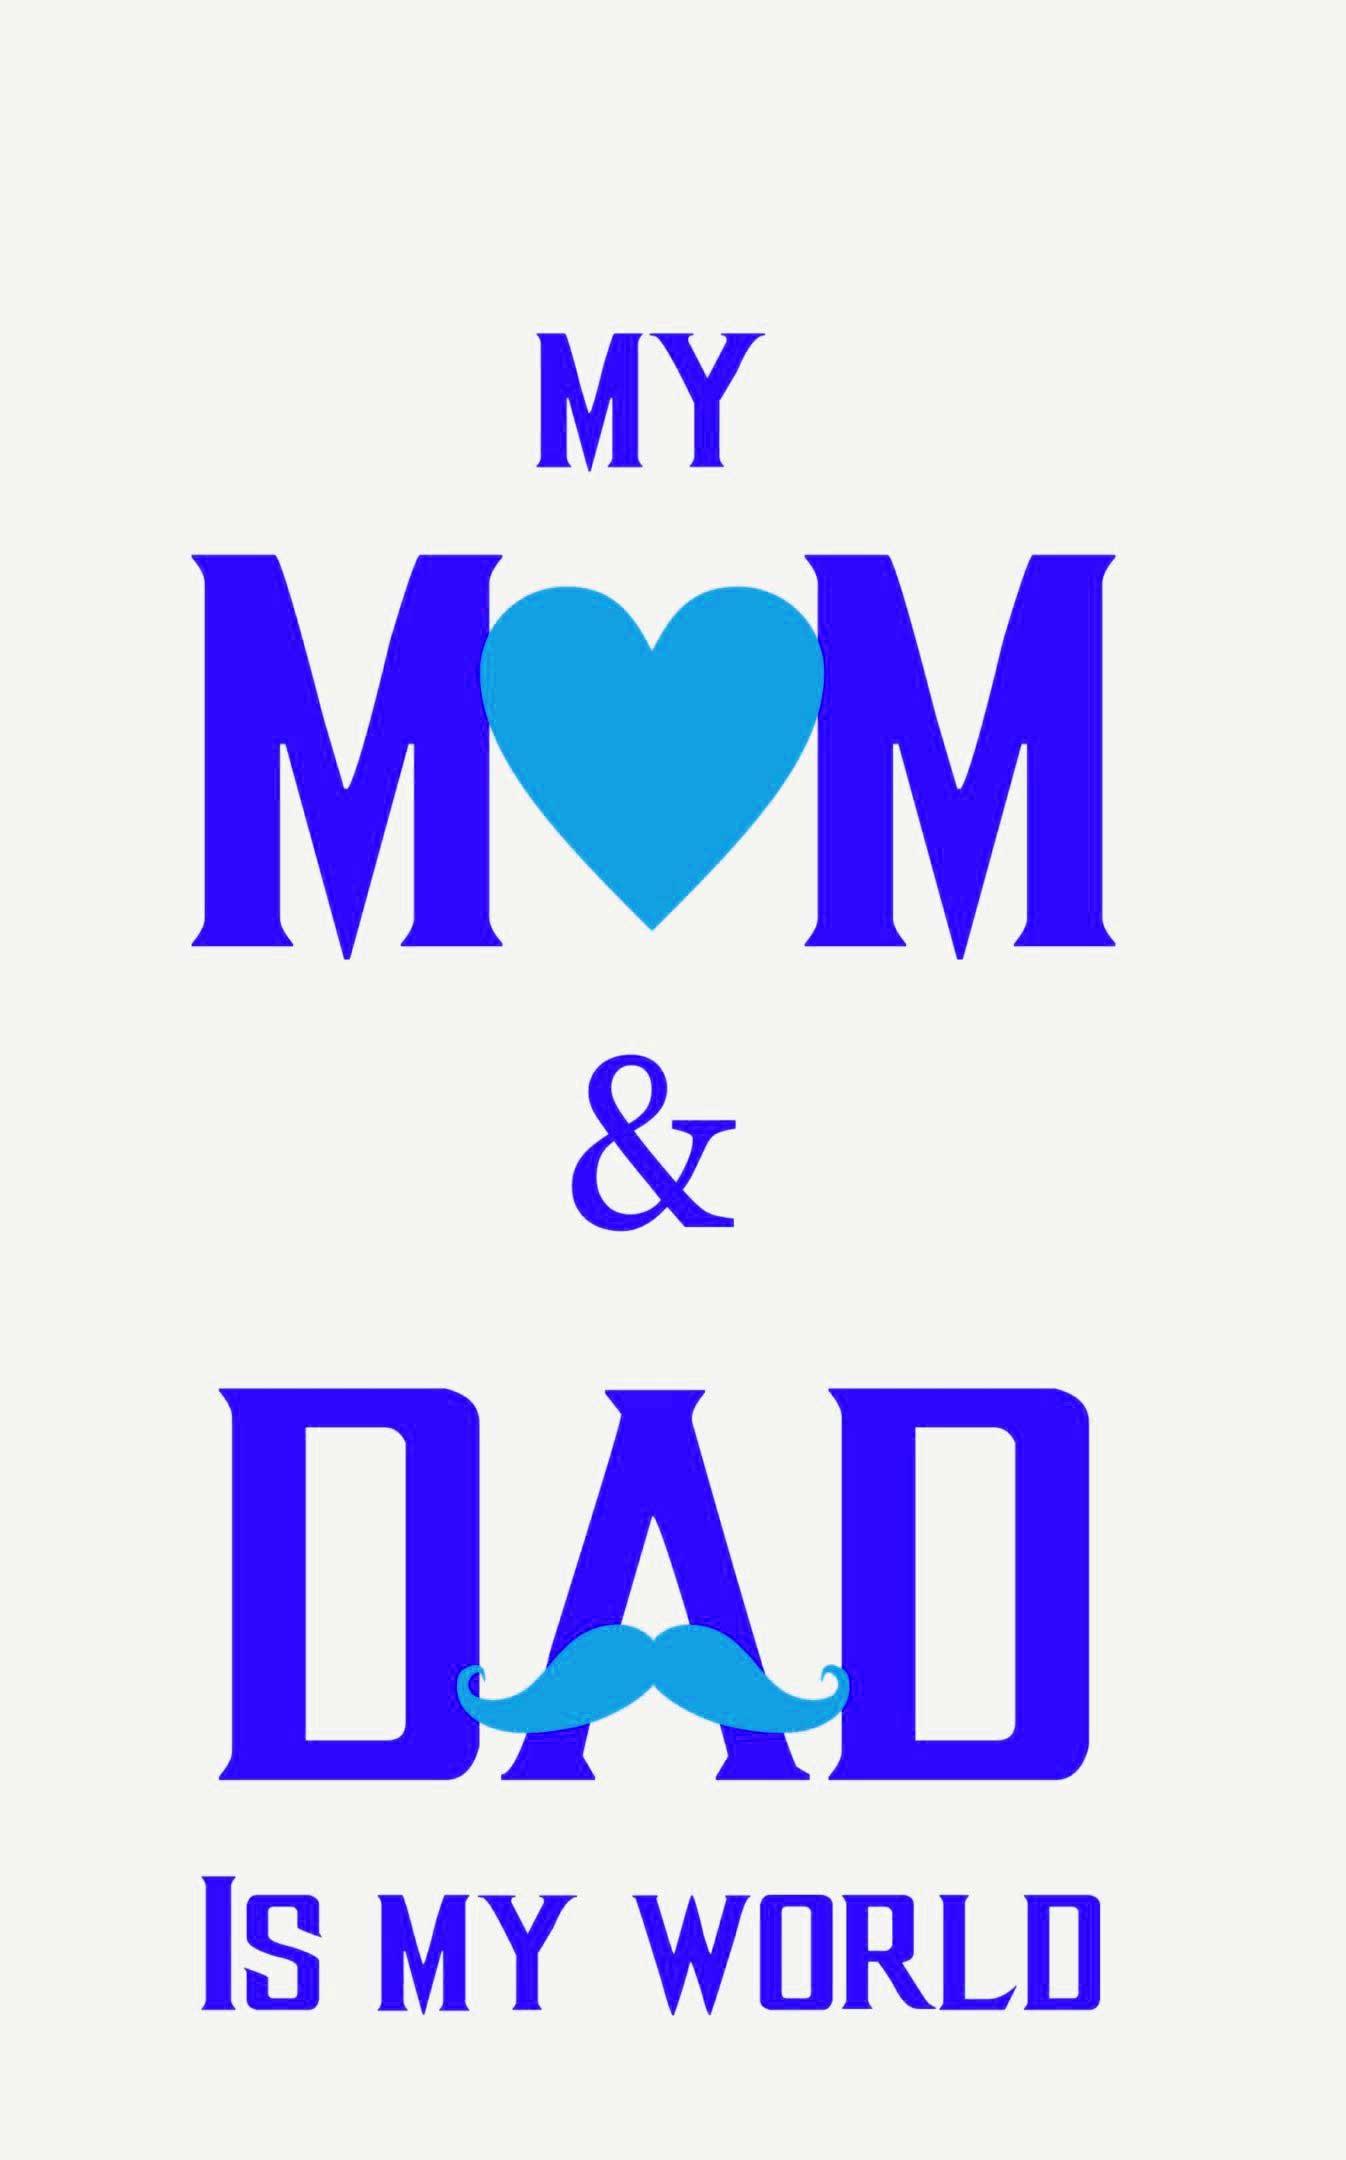 New Mom Dad Whatsapp DP Hd